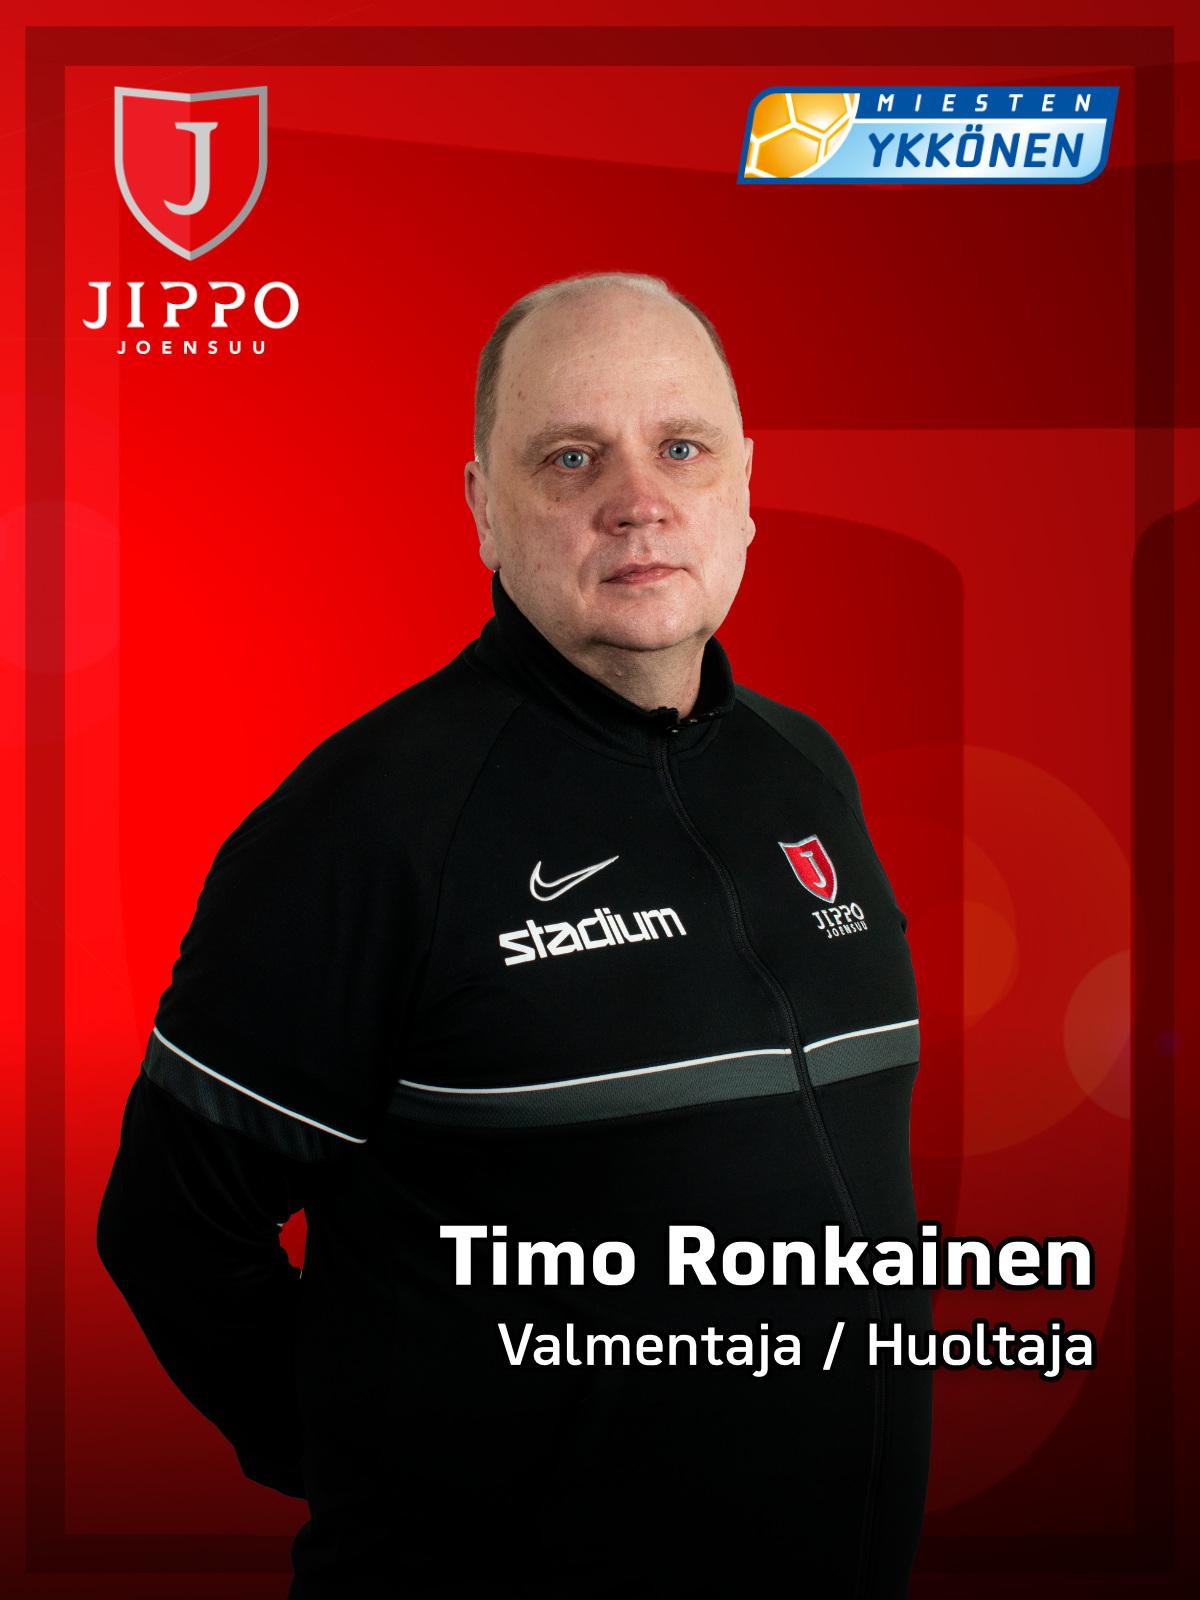 Timo Ronkainen